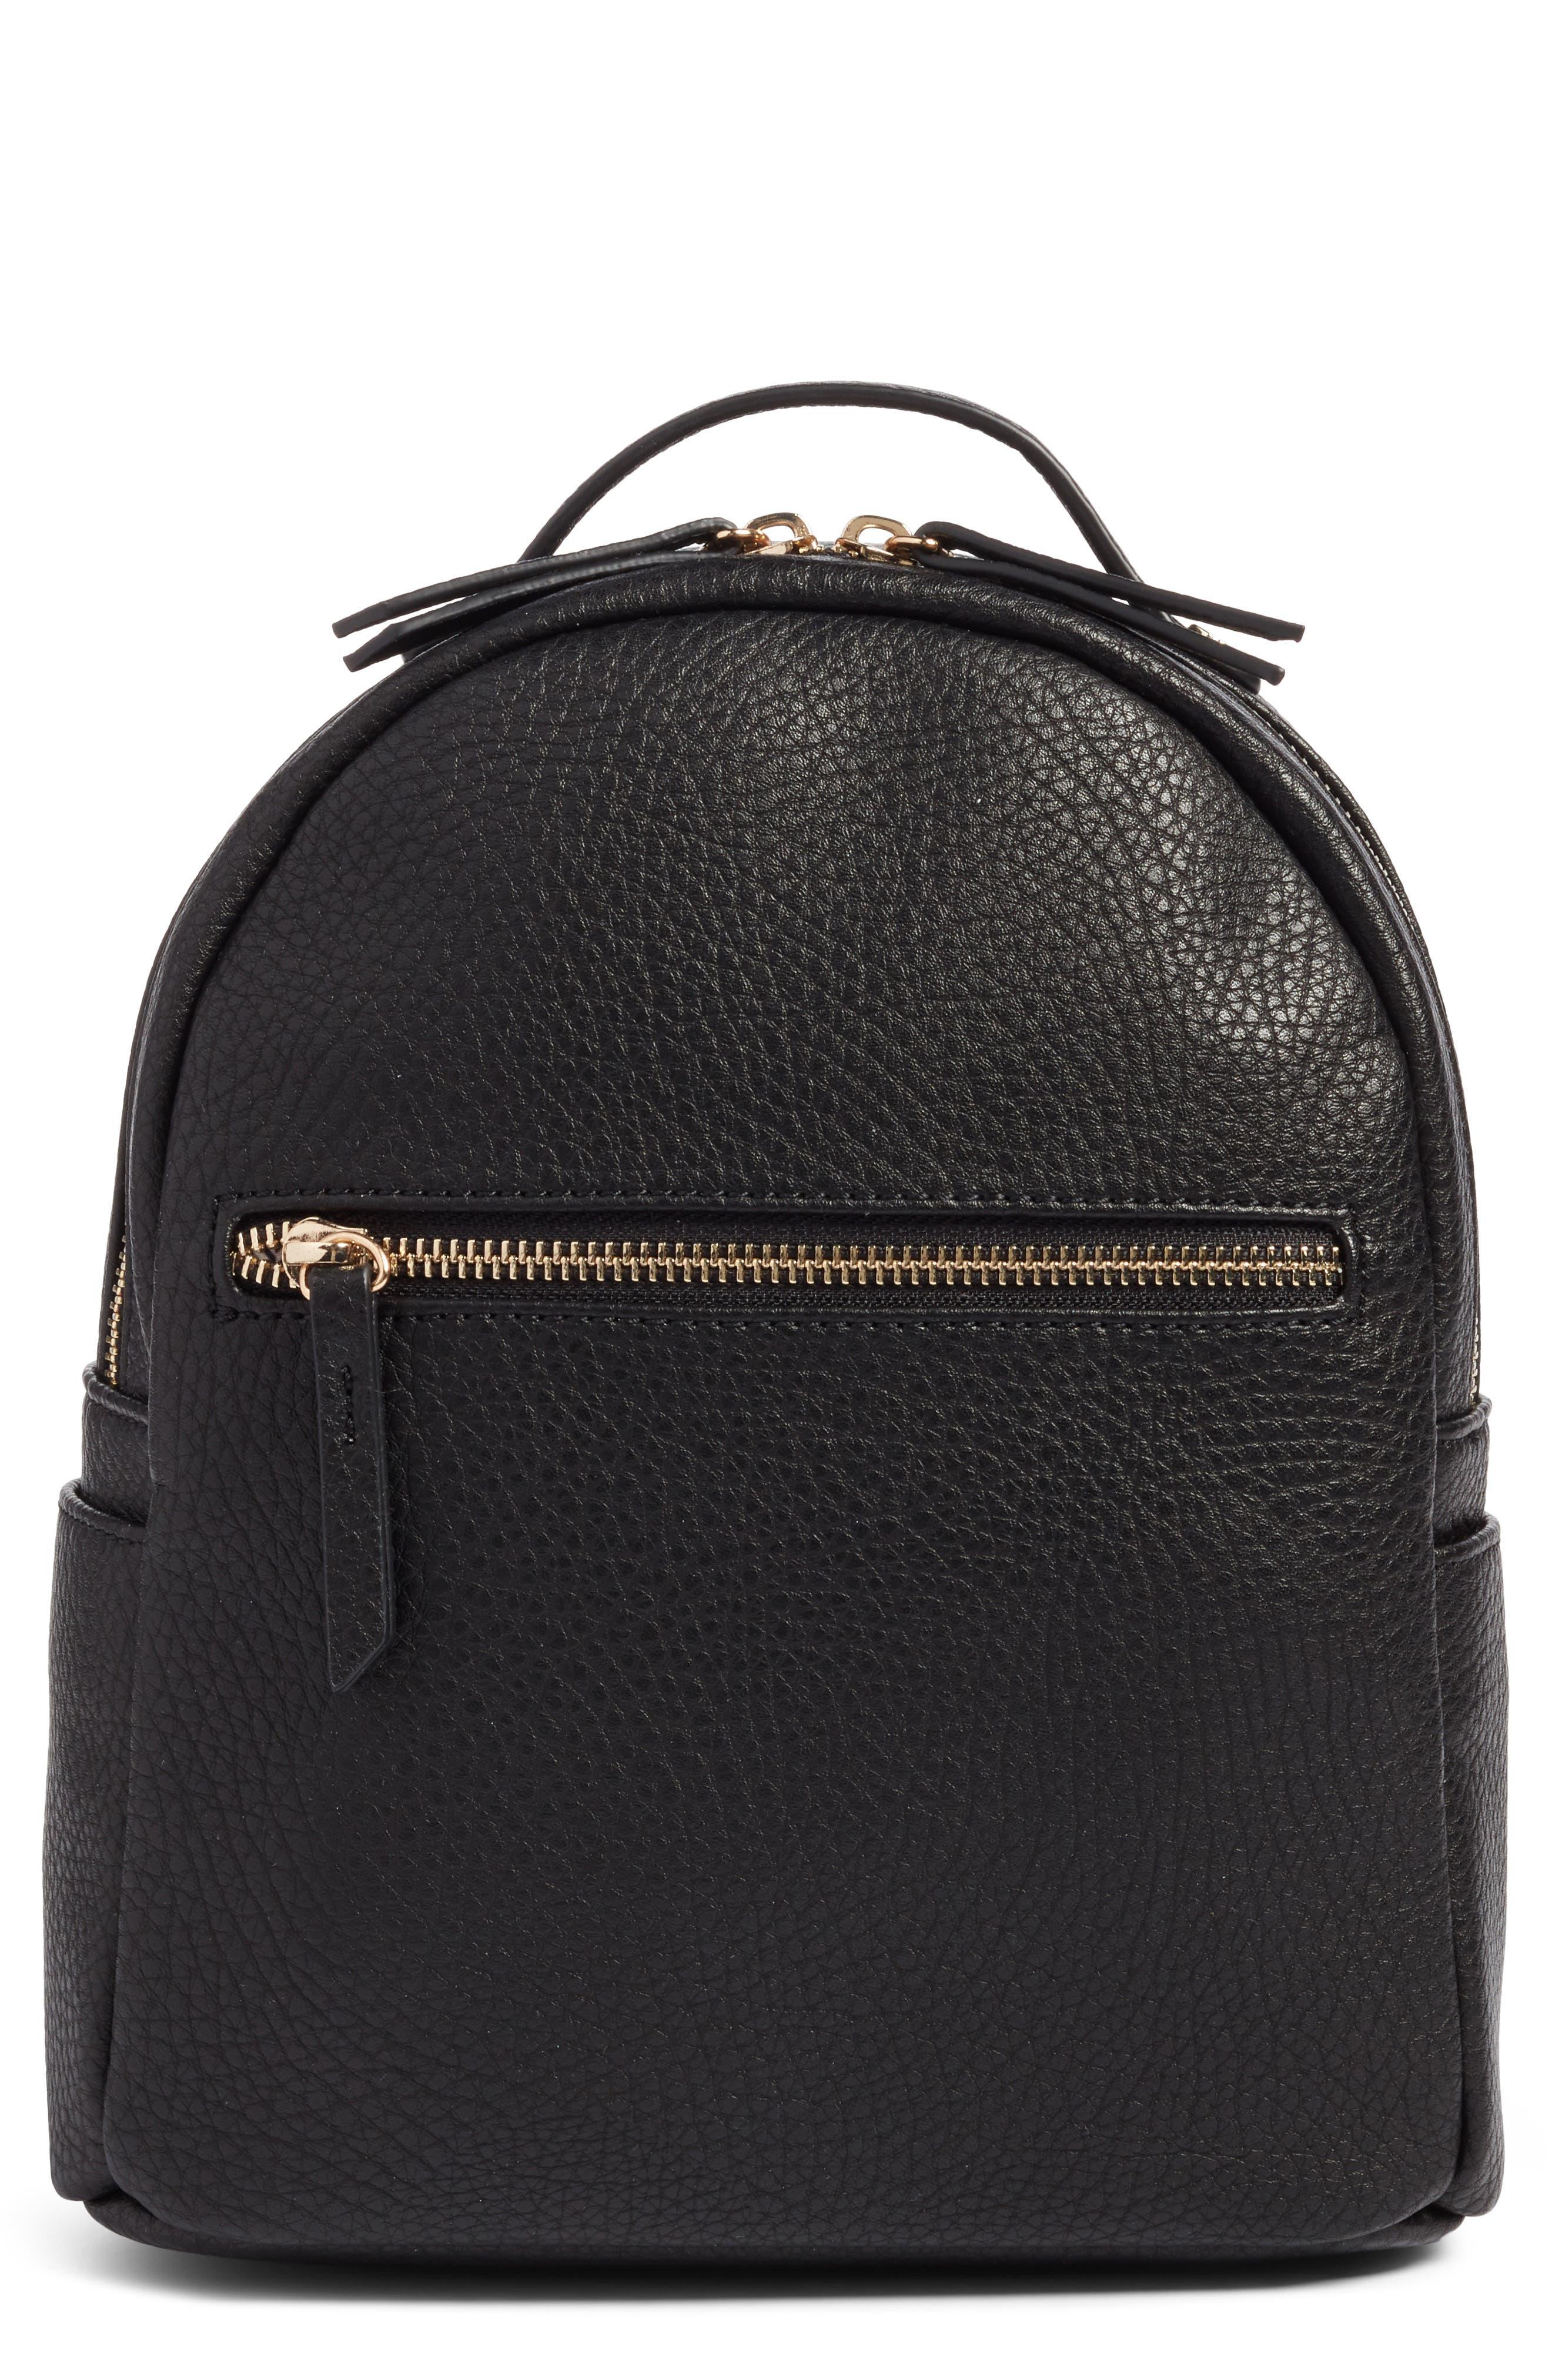 Alternate Image 1 Selected - Mali + Lili Faux Leather Backpack